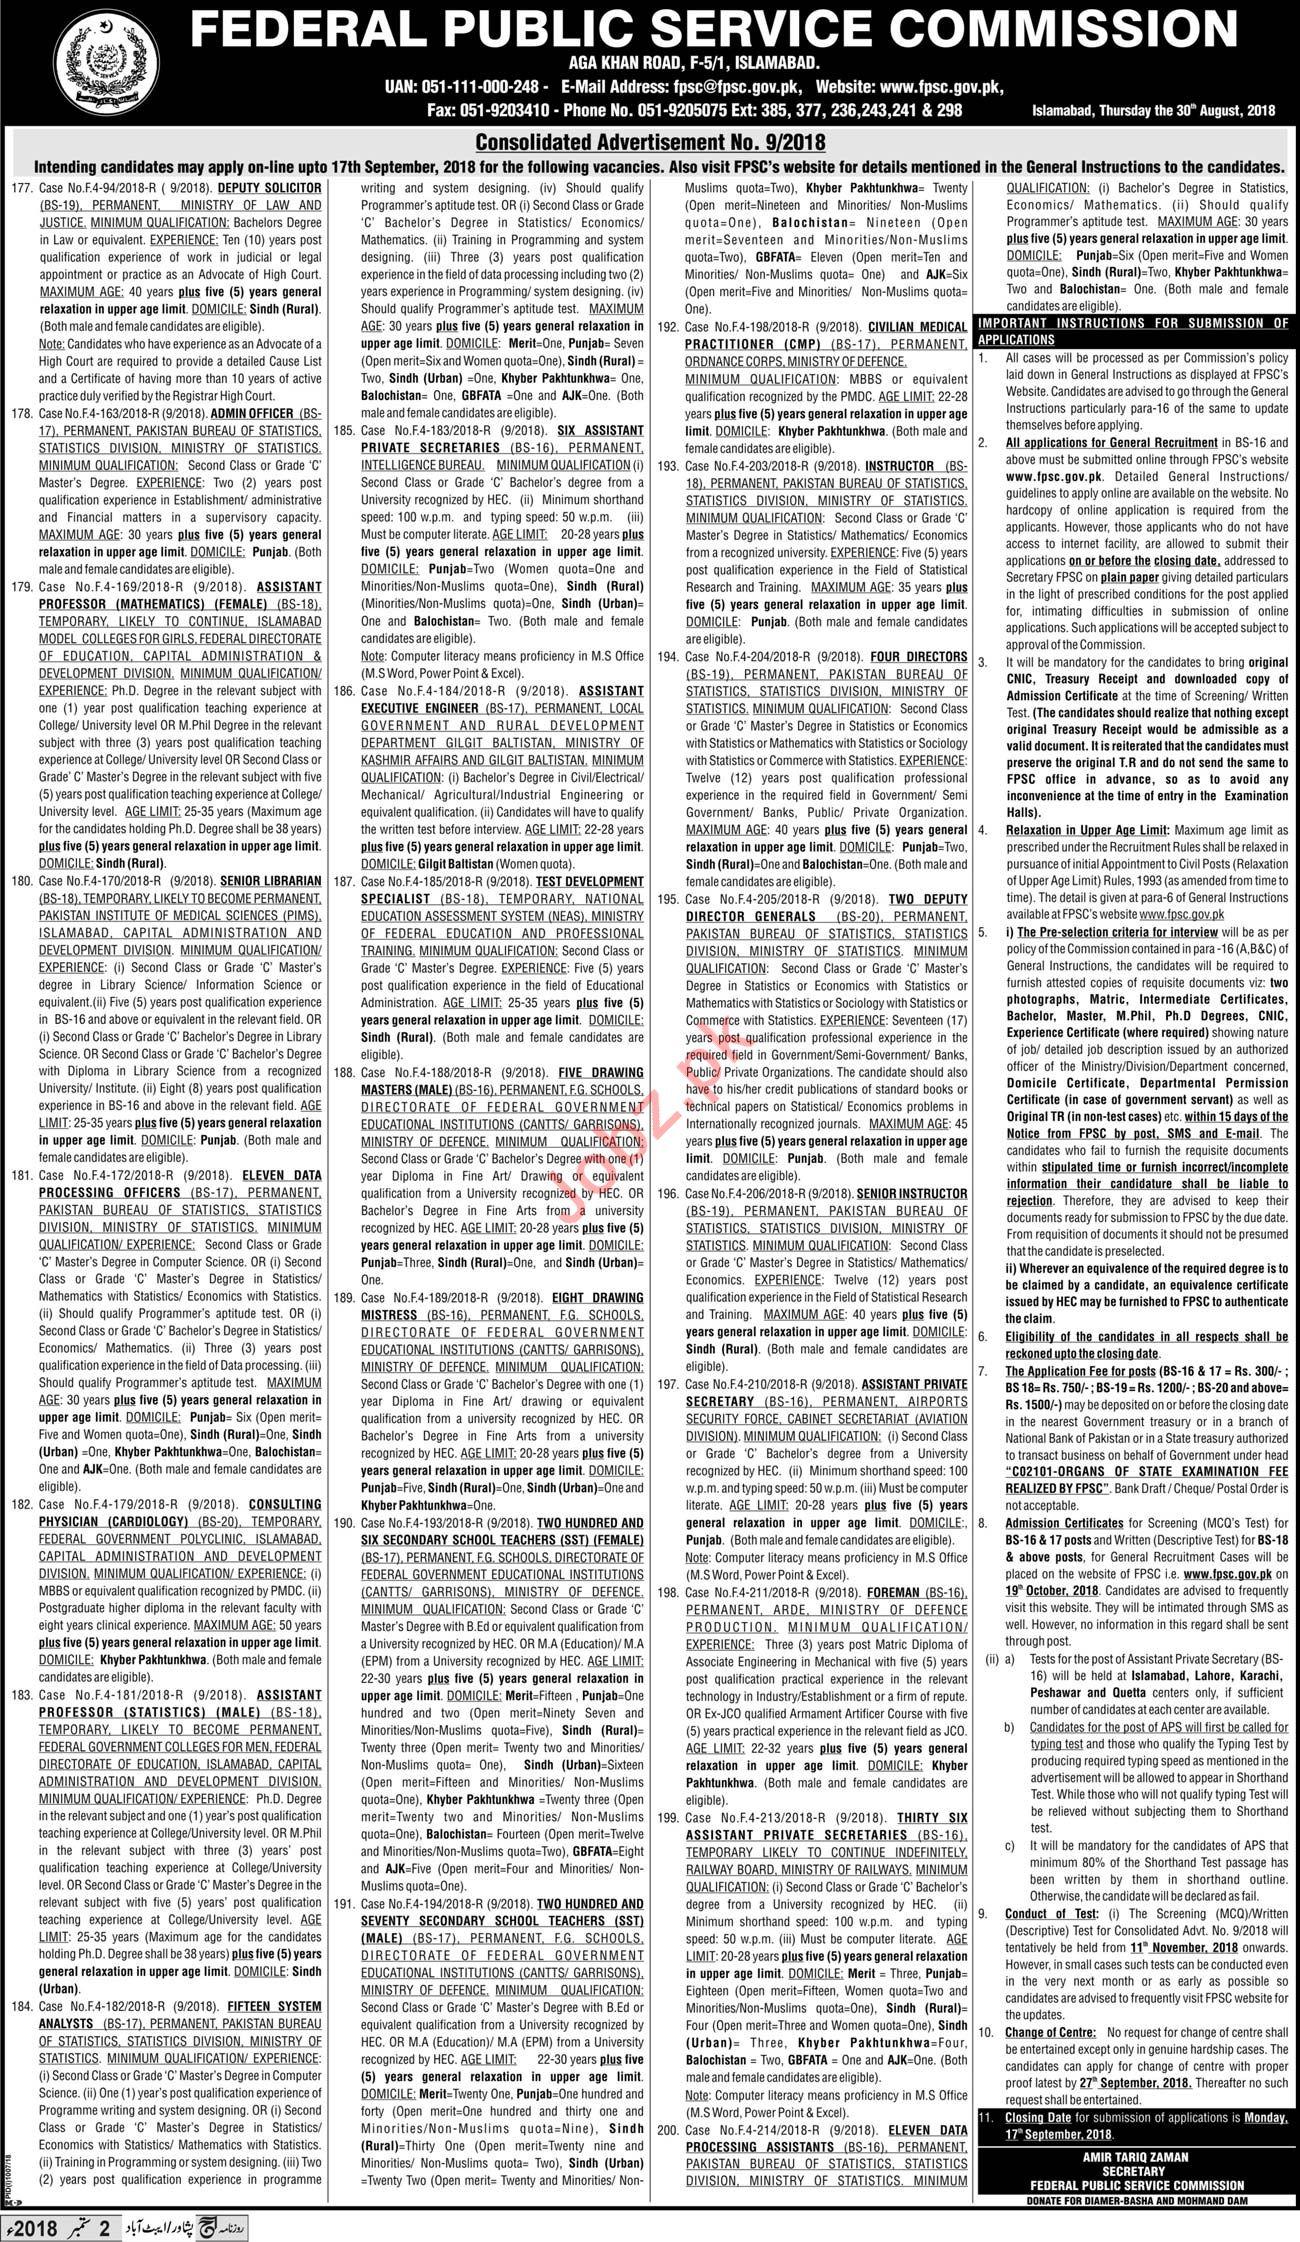 Federal Public Service Commission FPSC Vacancies